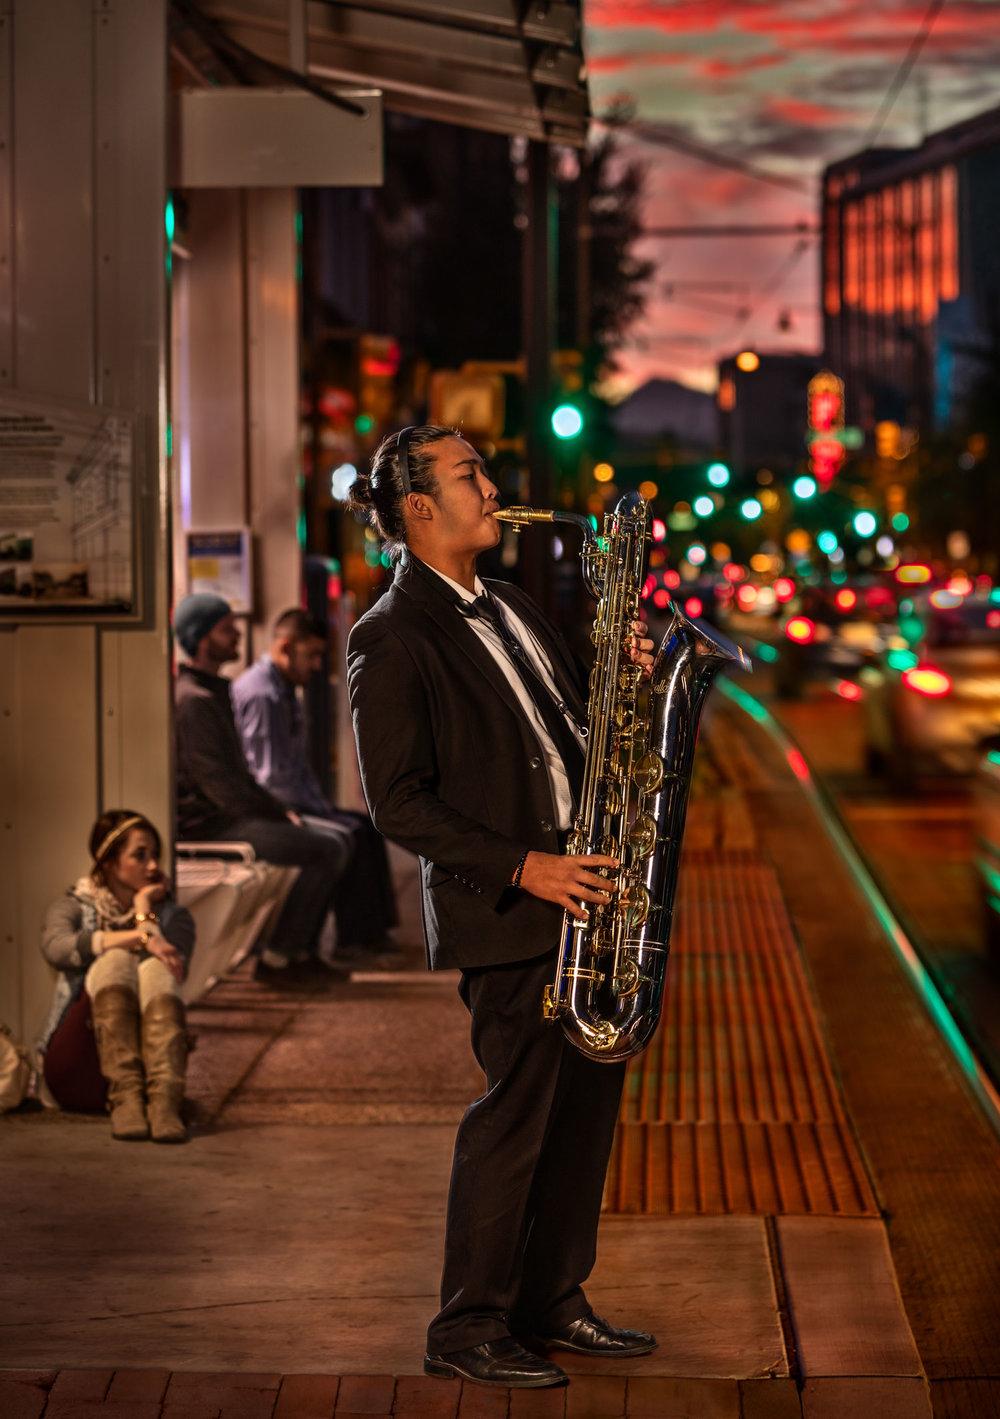 MecklerPhoto-Jazz-Fest_0502_F4.jpg